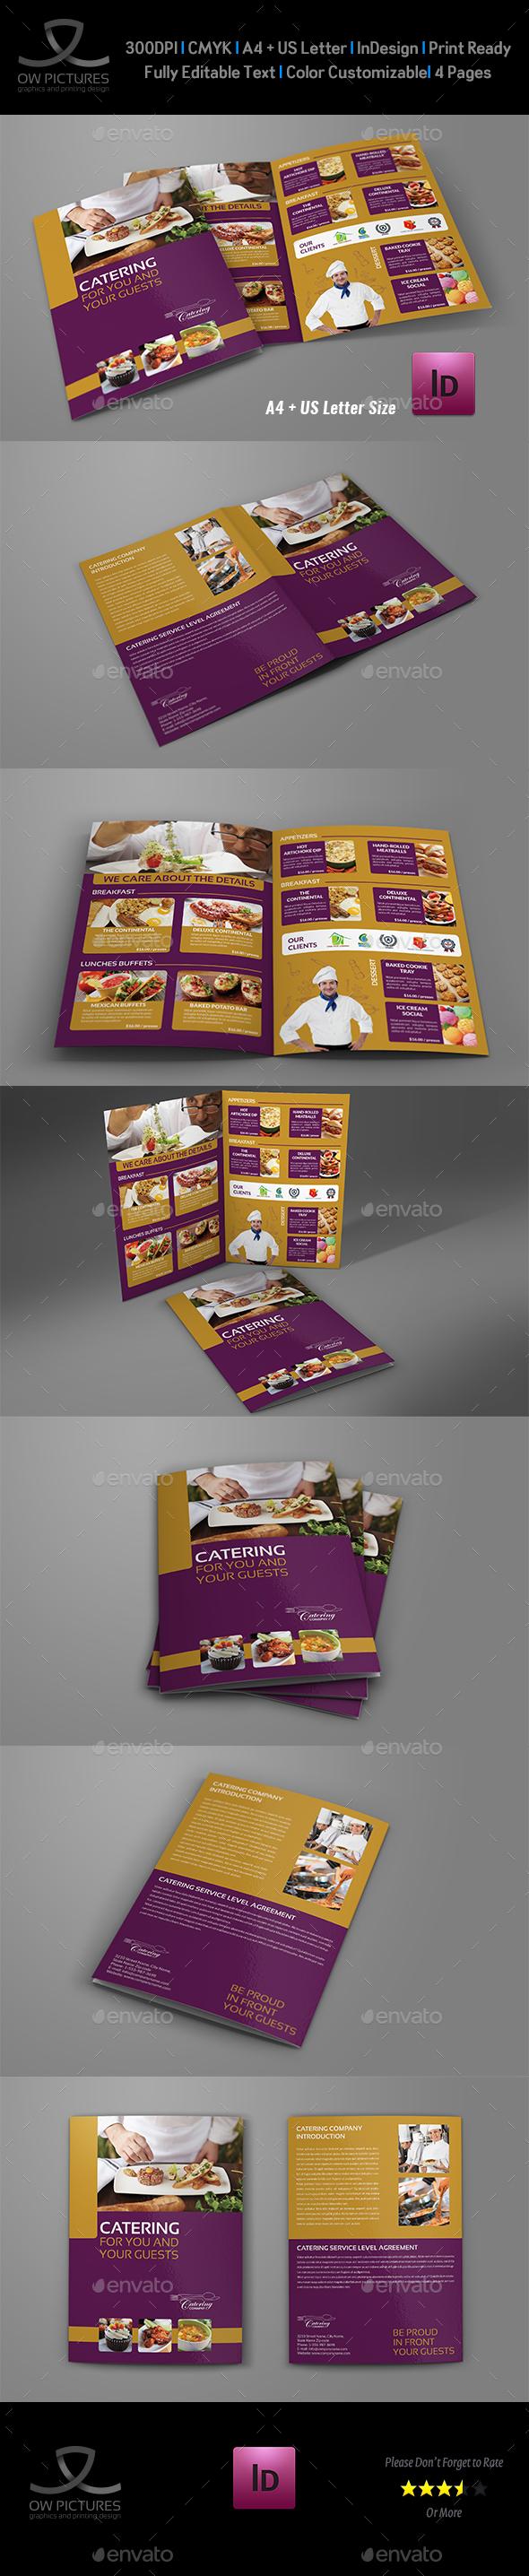 Catering Bi-Fold Brochure Template - Brochures Print Templates